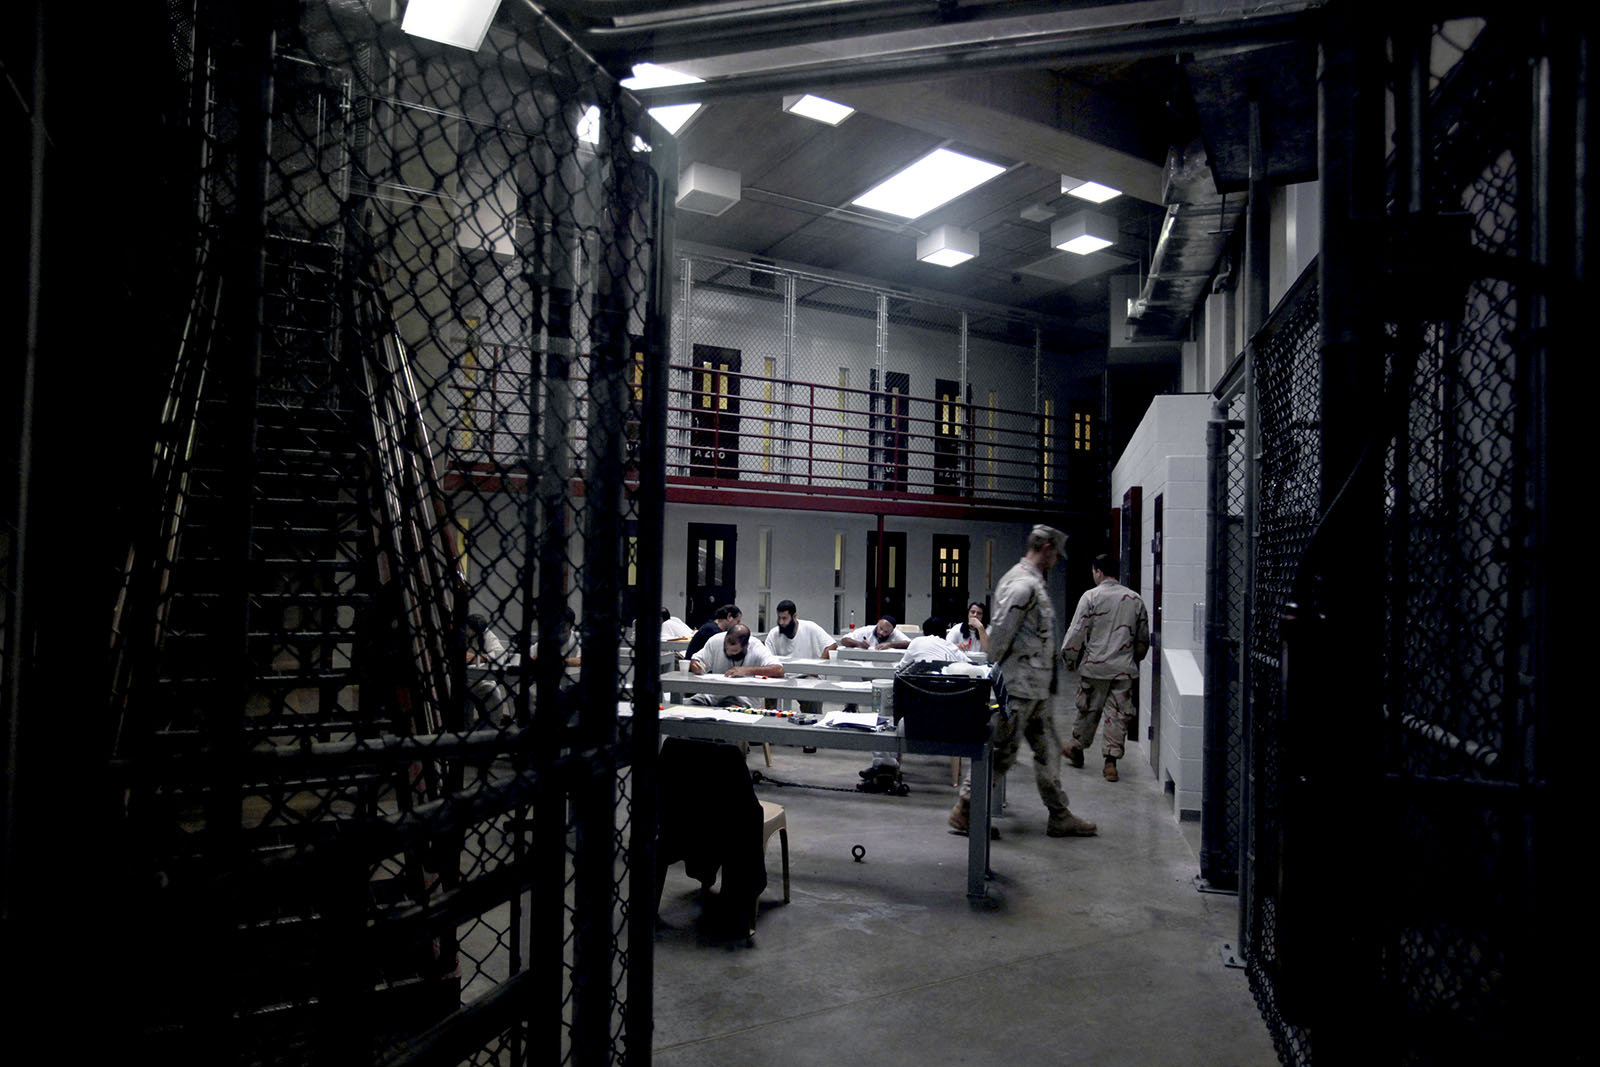 Prisoners at Guantanamo Bay are having a drawing class.